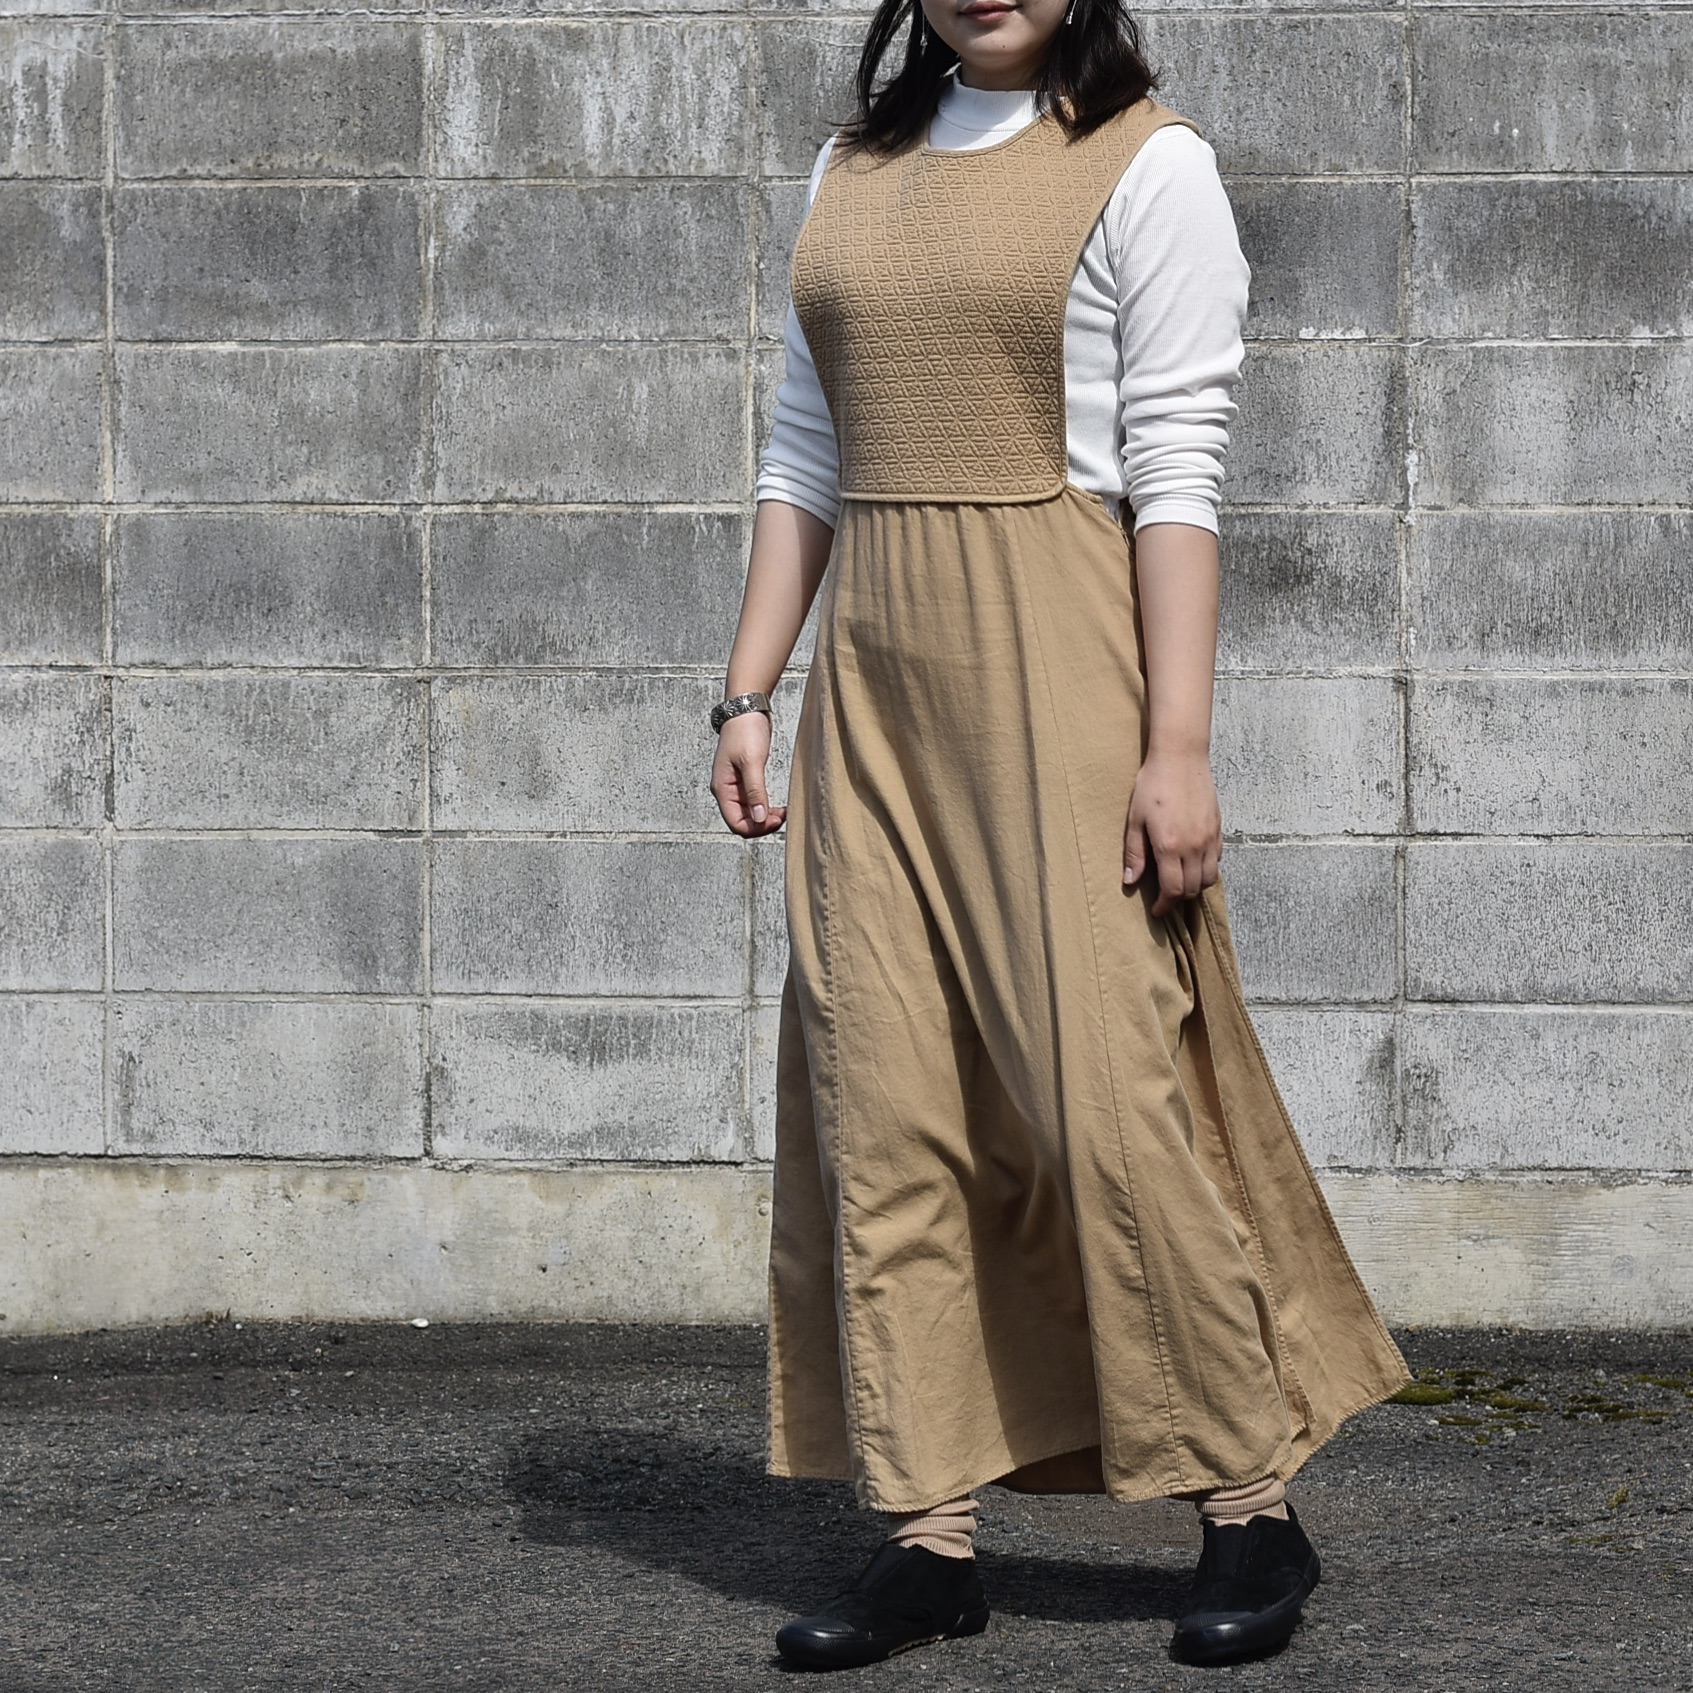 ARCHI / SKIMIA QUILT DRESS (beige) 着用(身長160cm)